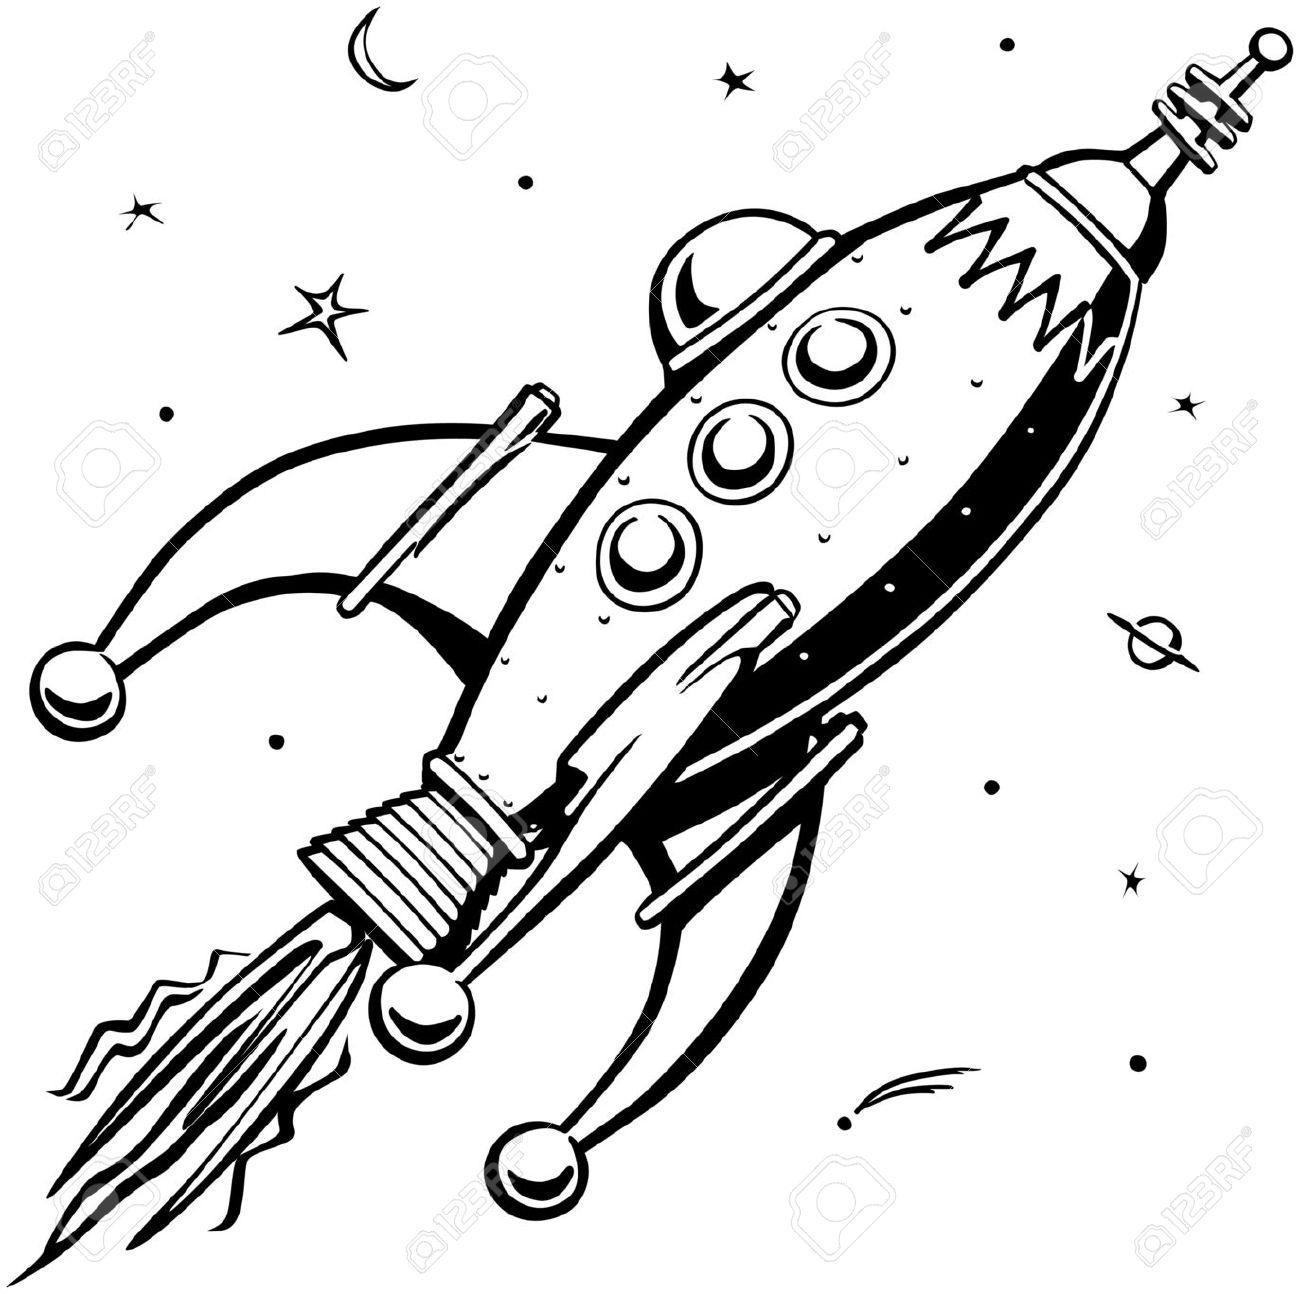 1300x1294 Drawing Rocket Ship Rocket Ship Drawing Easy